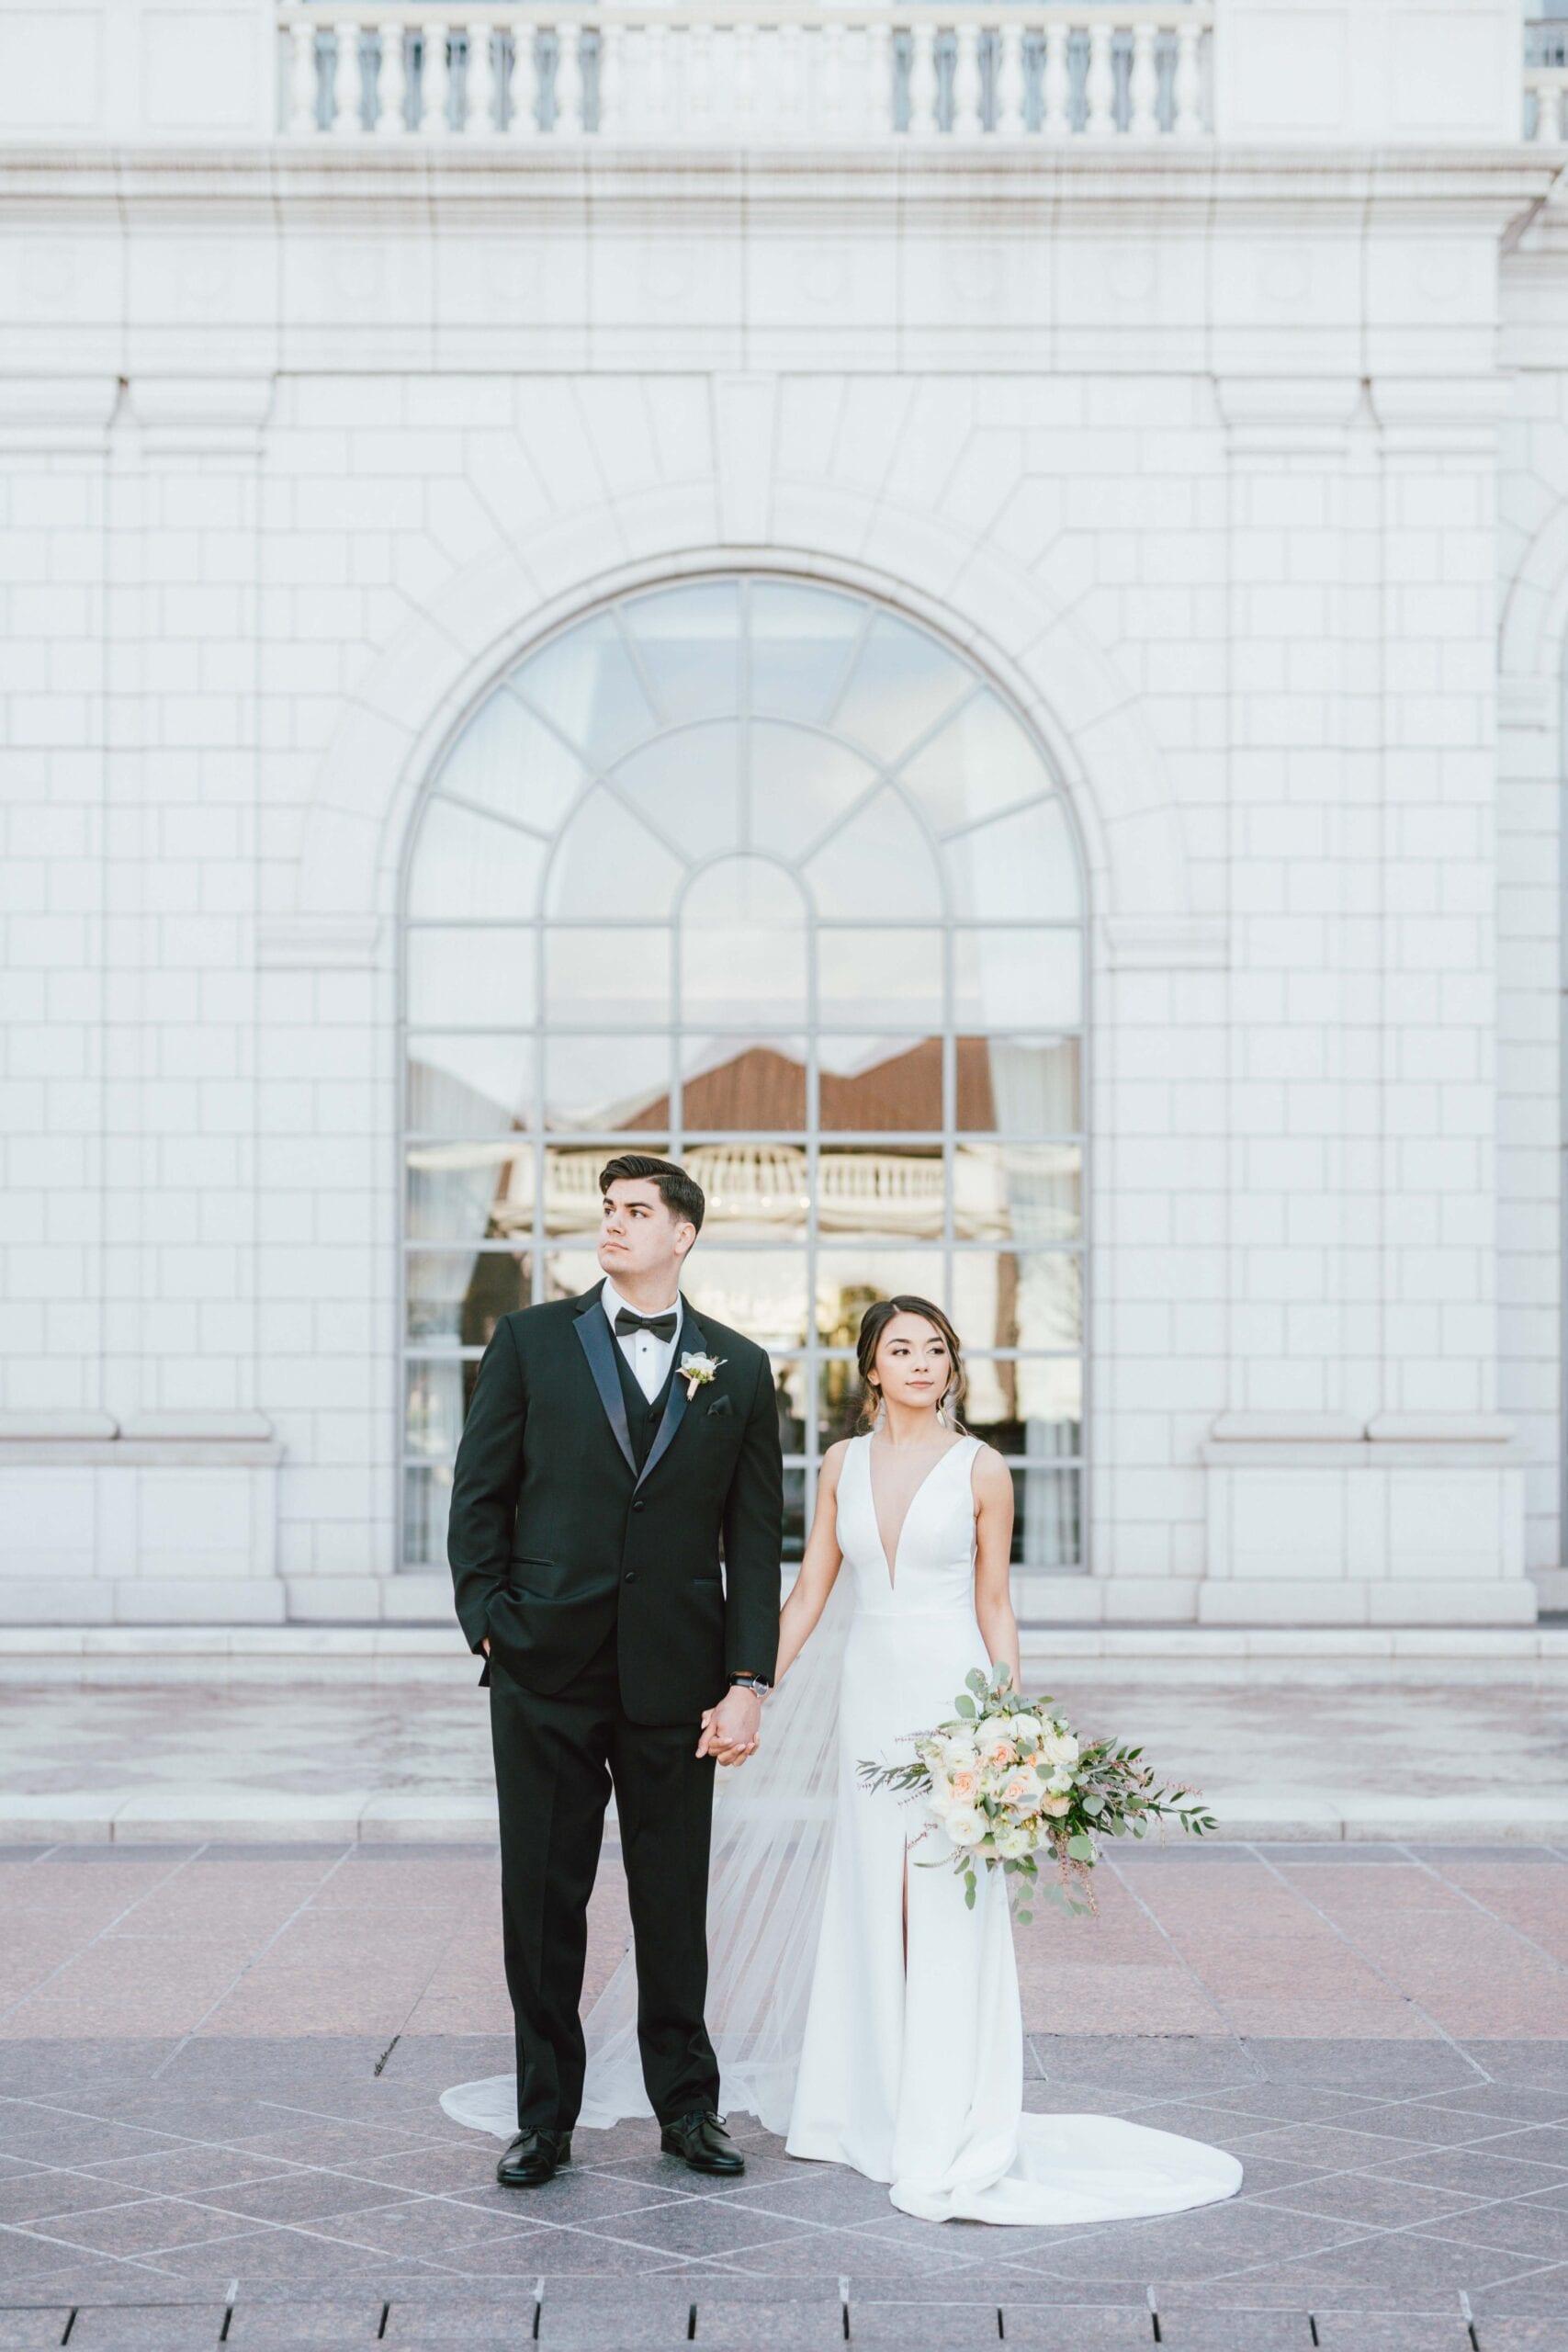 love brittny wedding at grand america hotel picture wide portrait